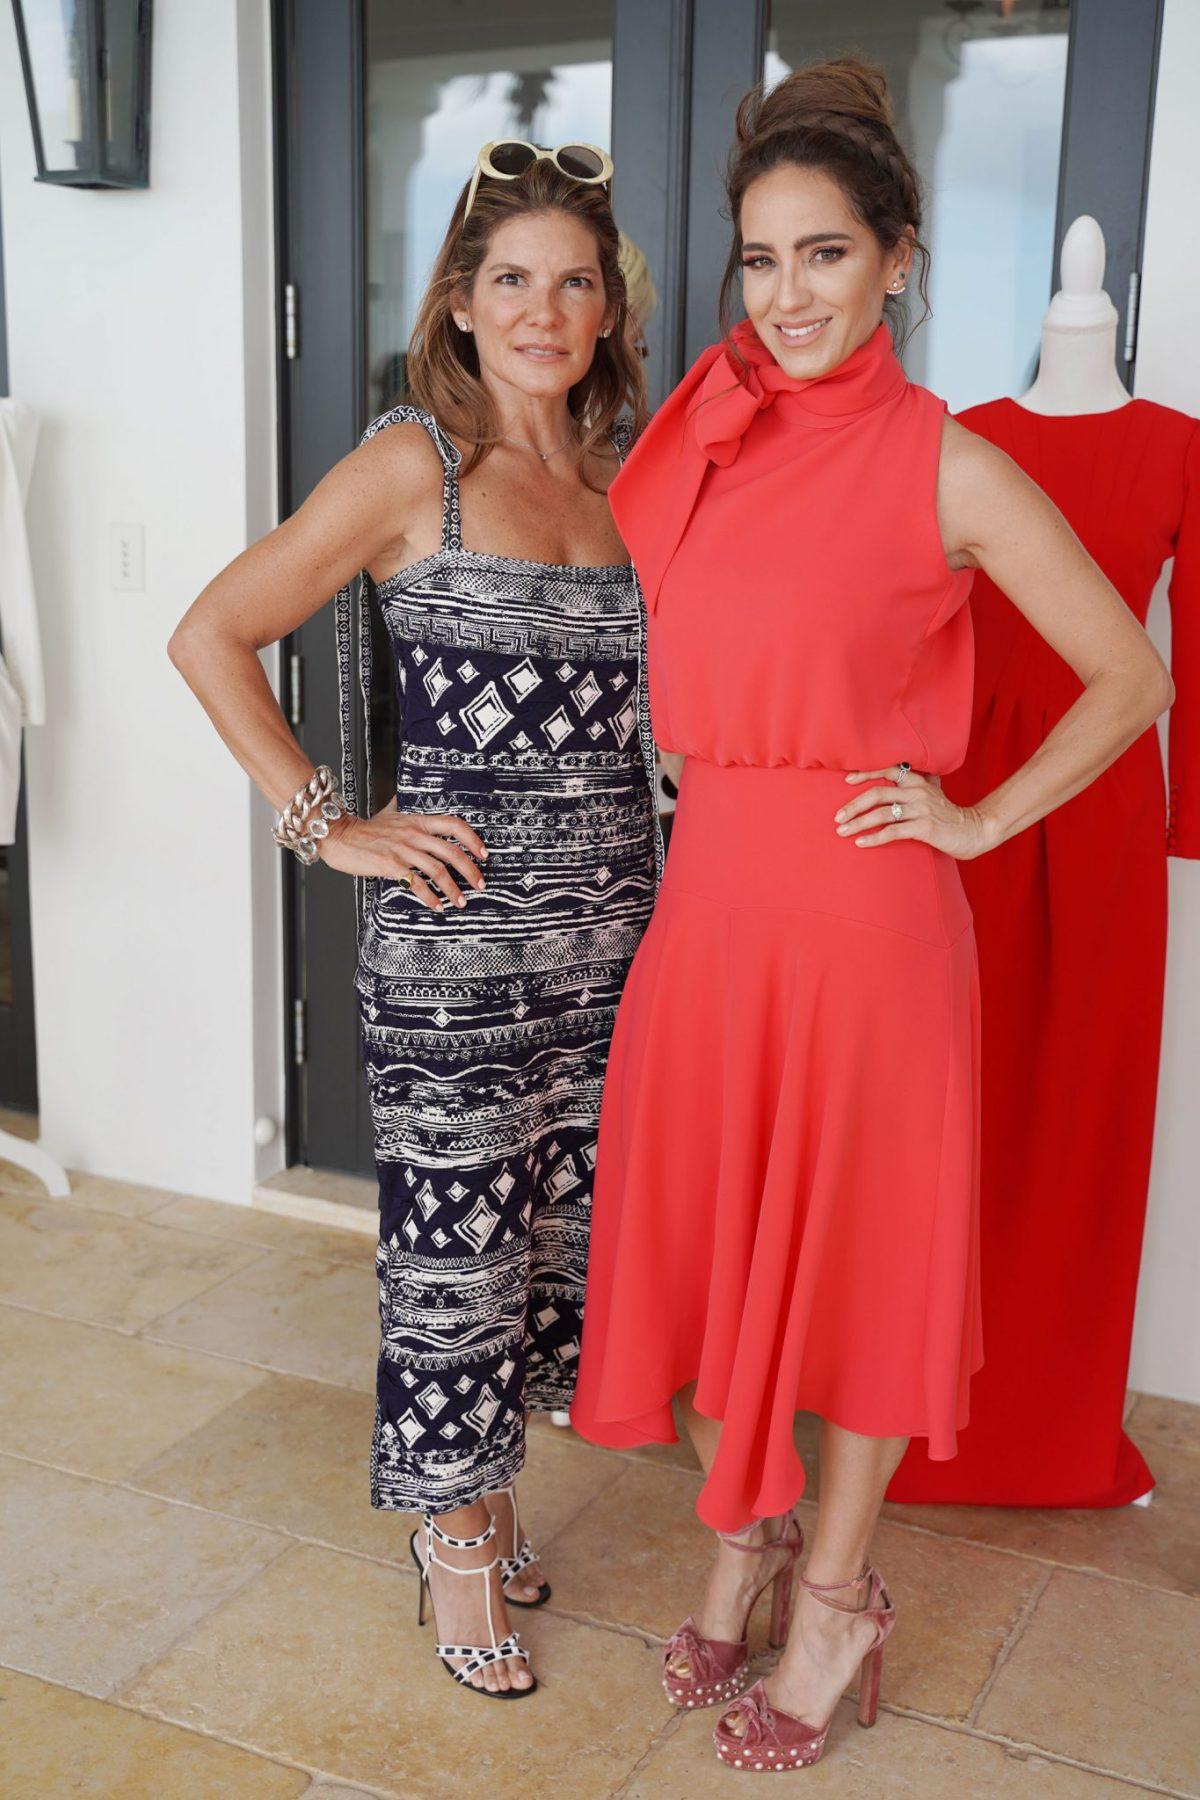 Patricia Suarez & Andrea Minski